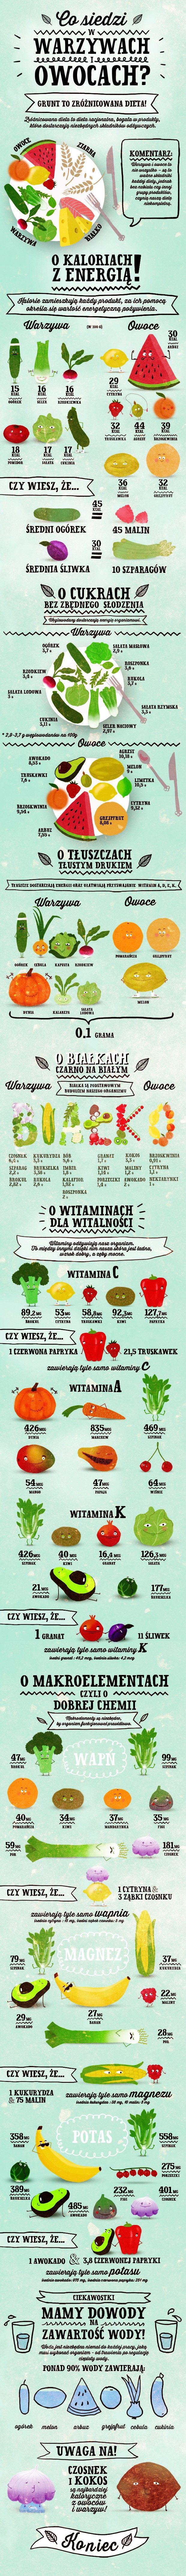 inofgrafiak_warzywa_i_owoce